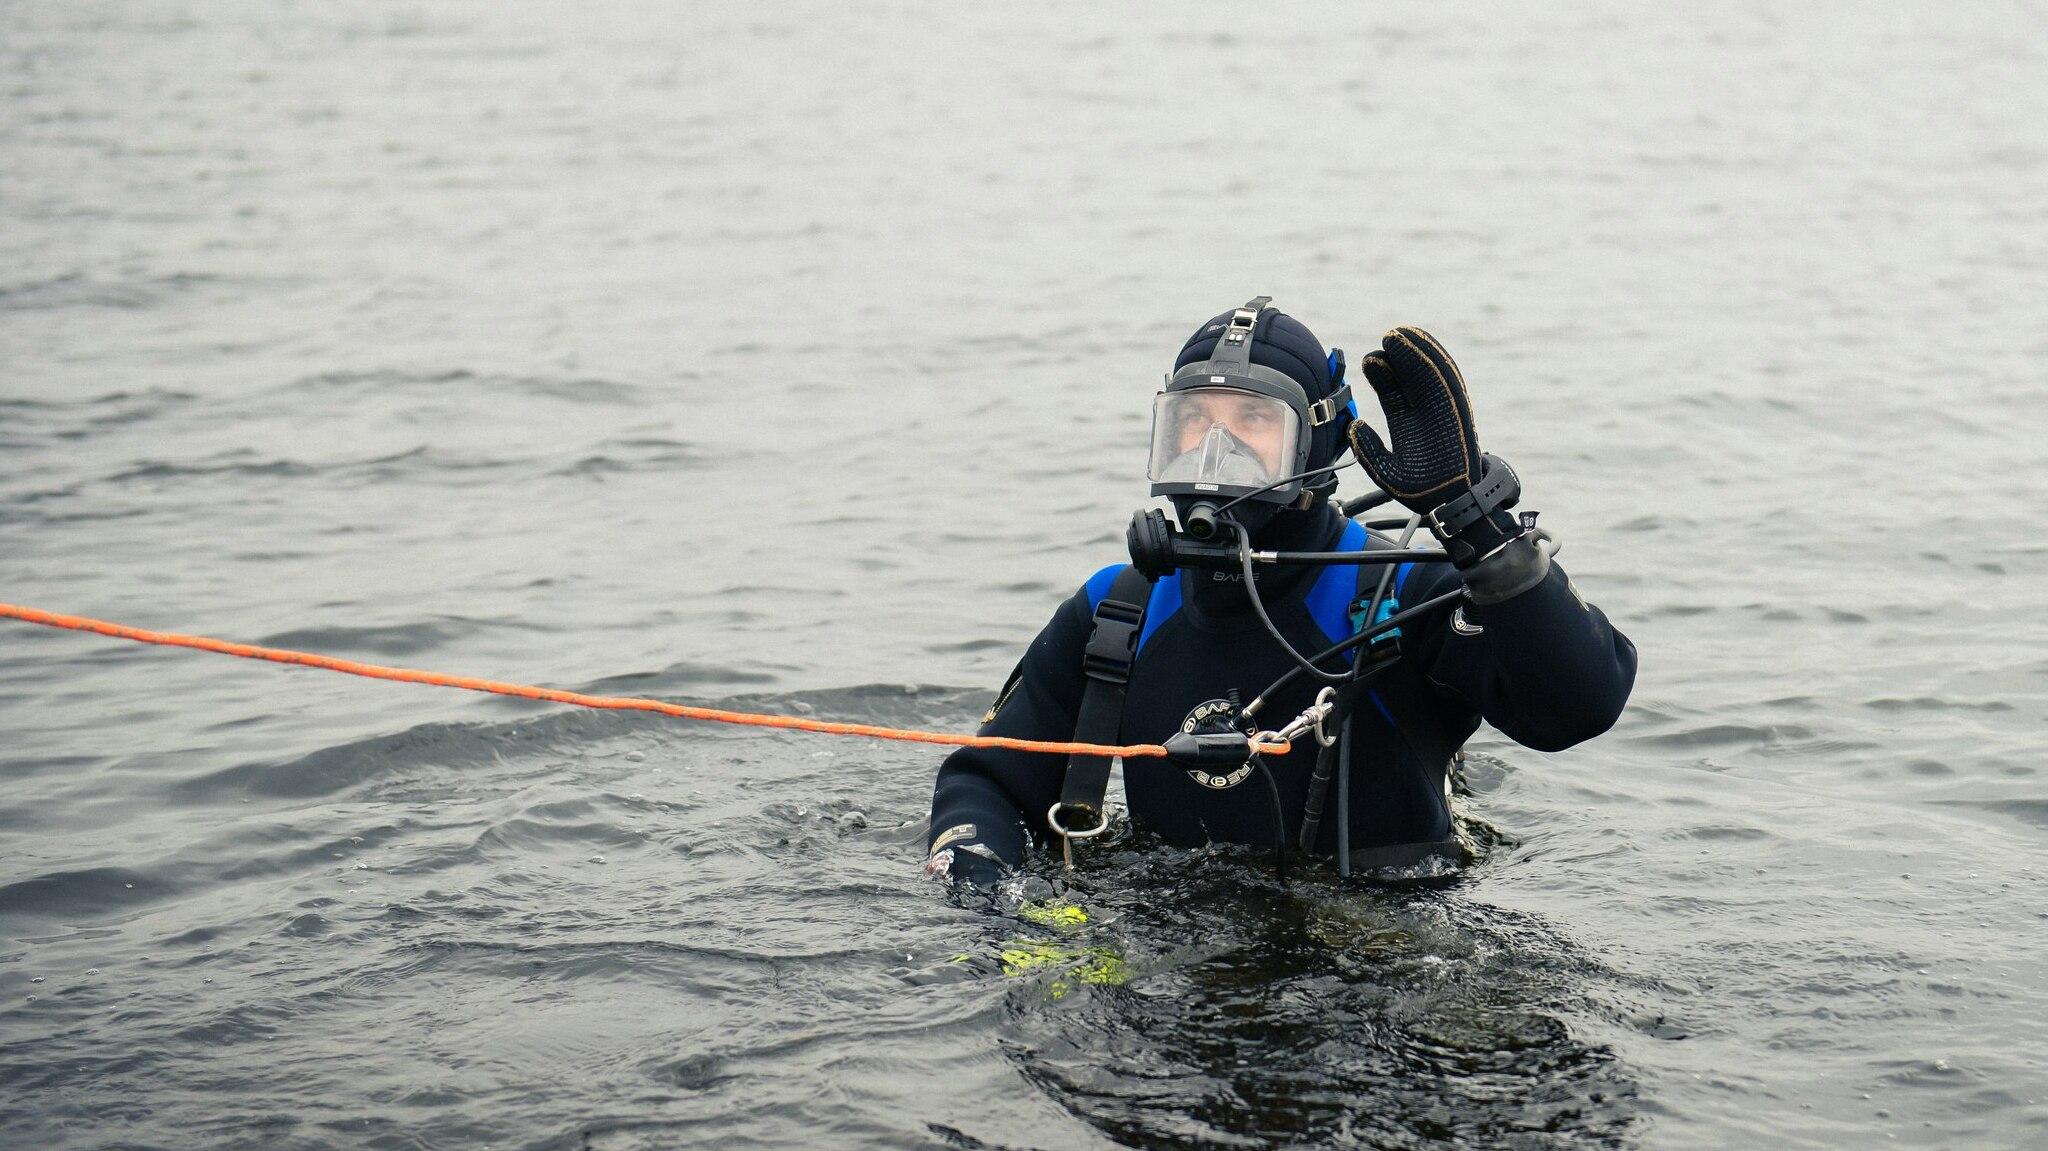 16 водолазов проверят костромское дно